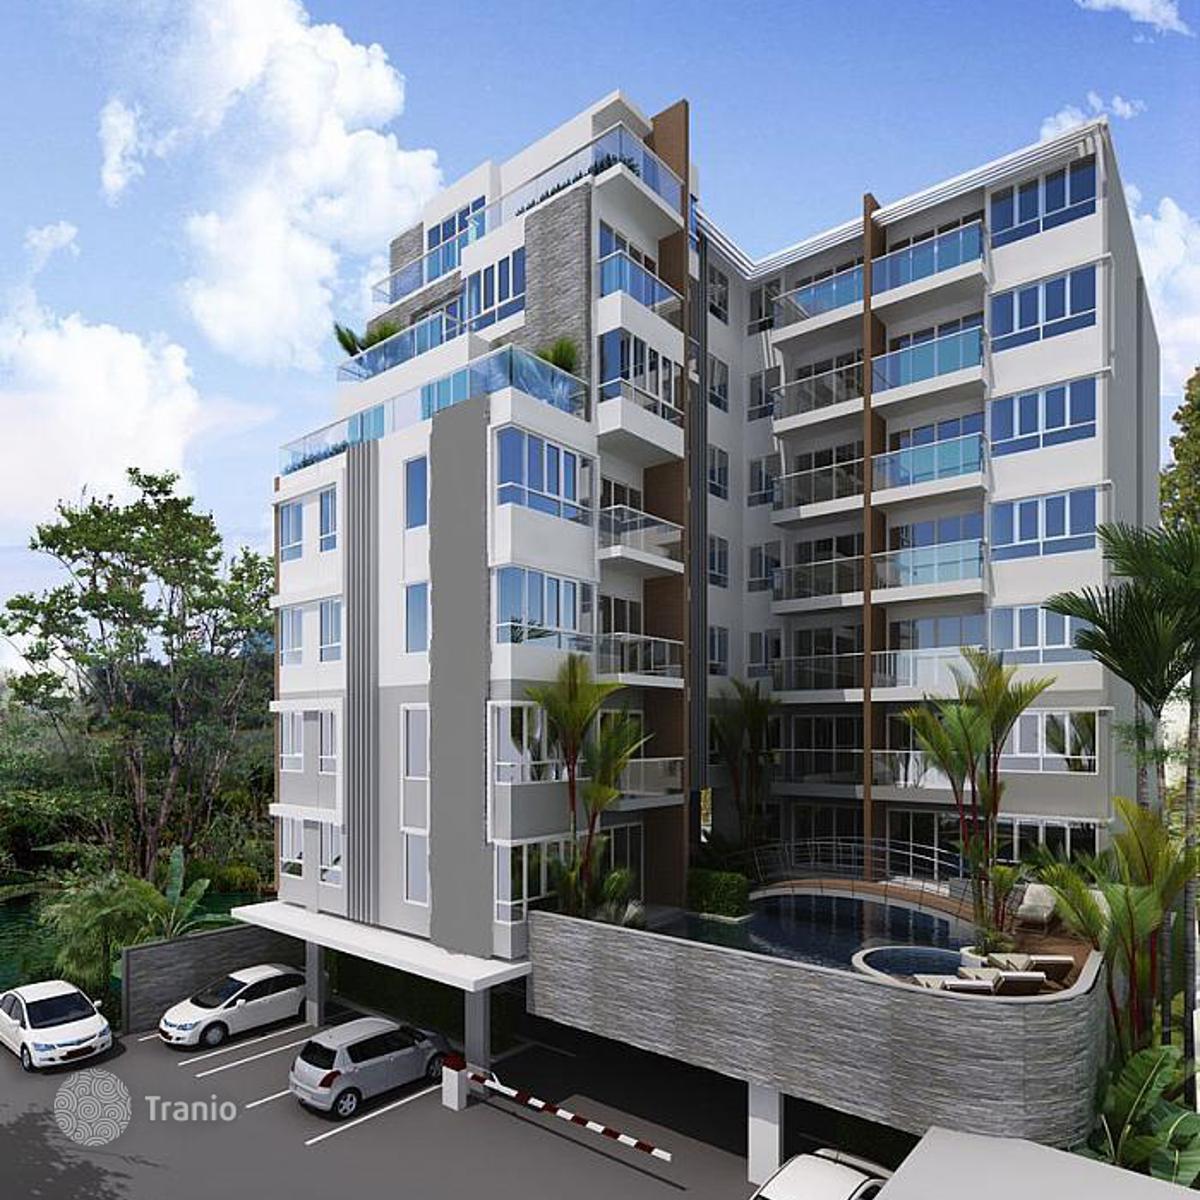 Listing #1324883 In Phuket City, Phuket, Thailand